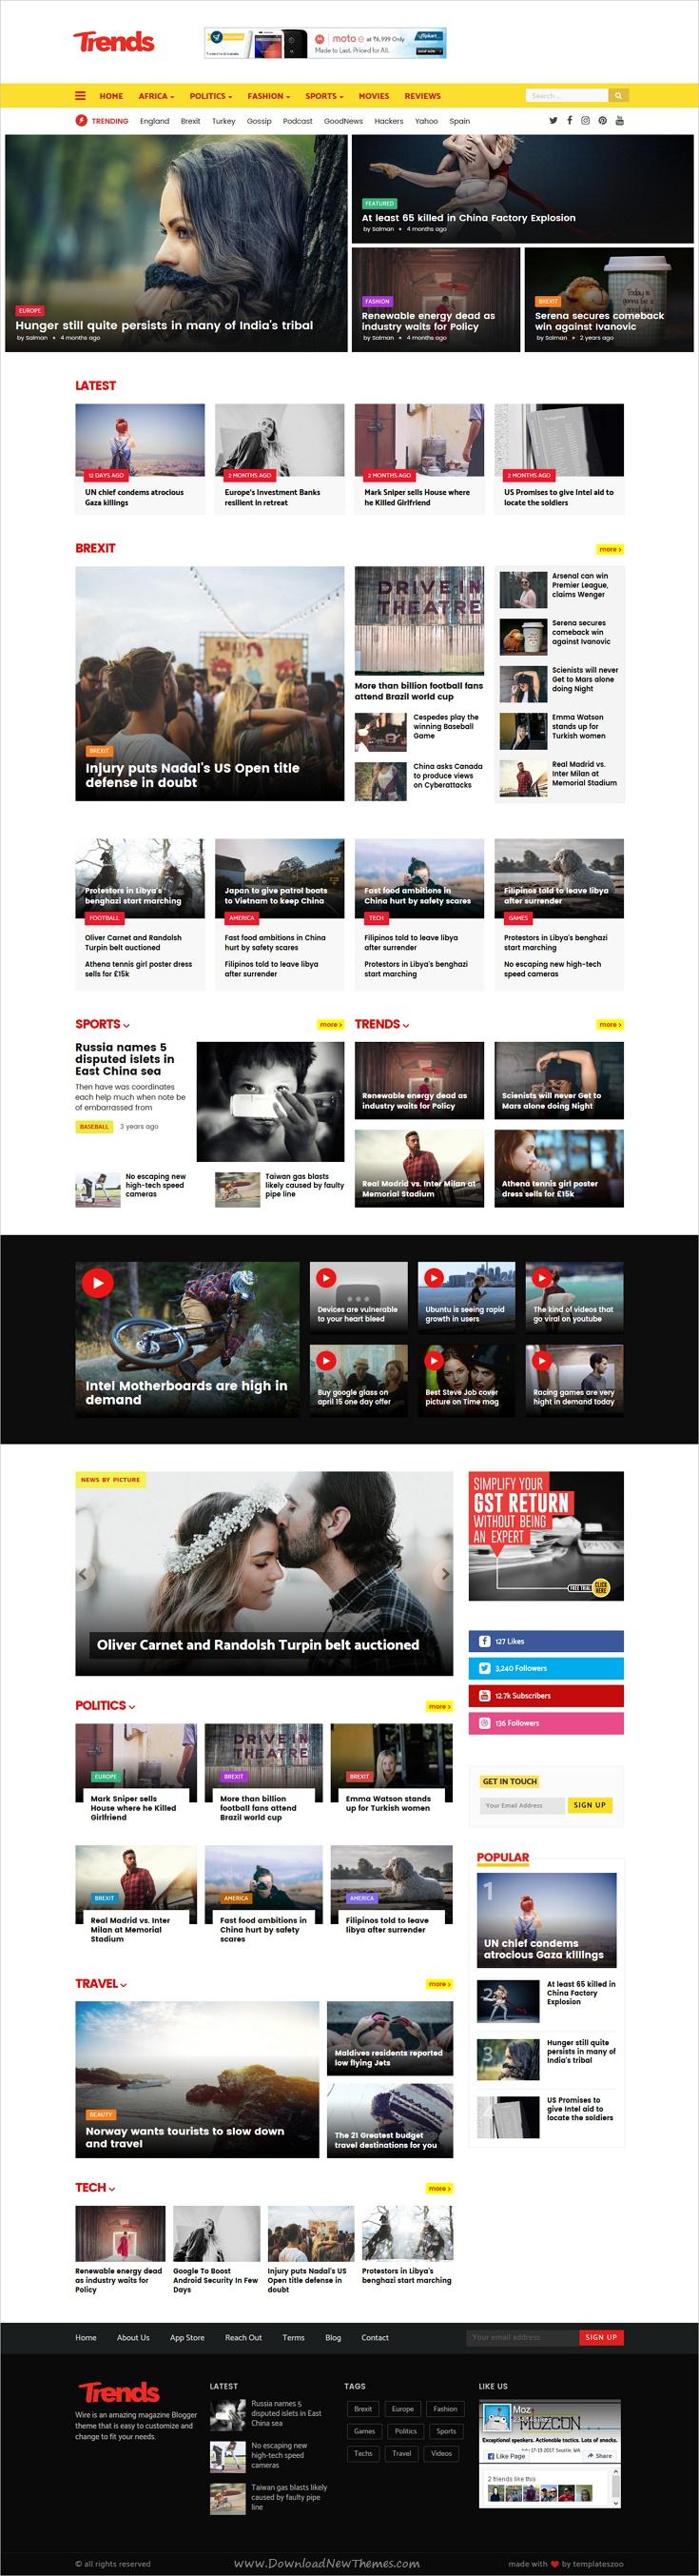 Trends - News/Magazine Responsive Blogger Template   Template